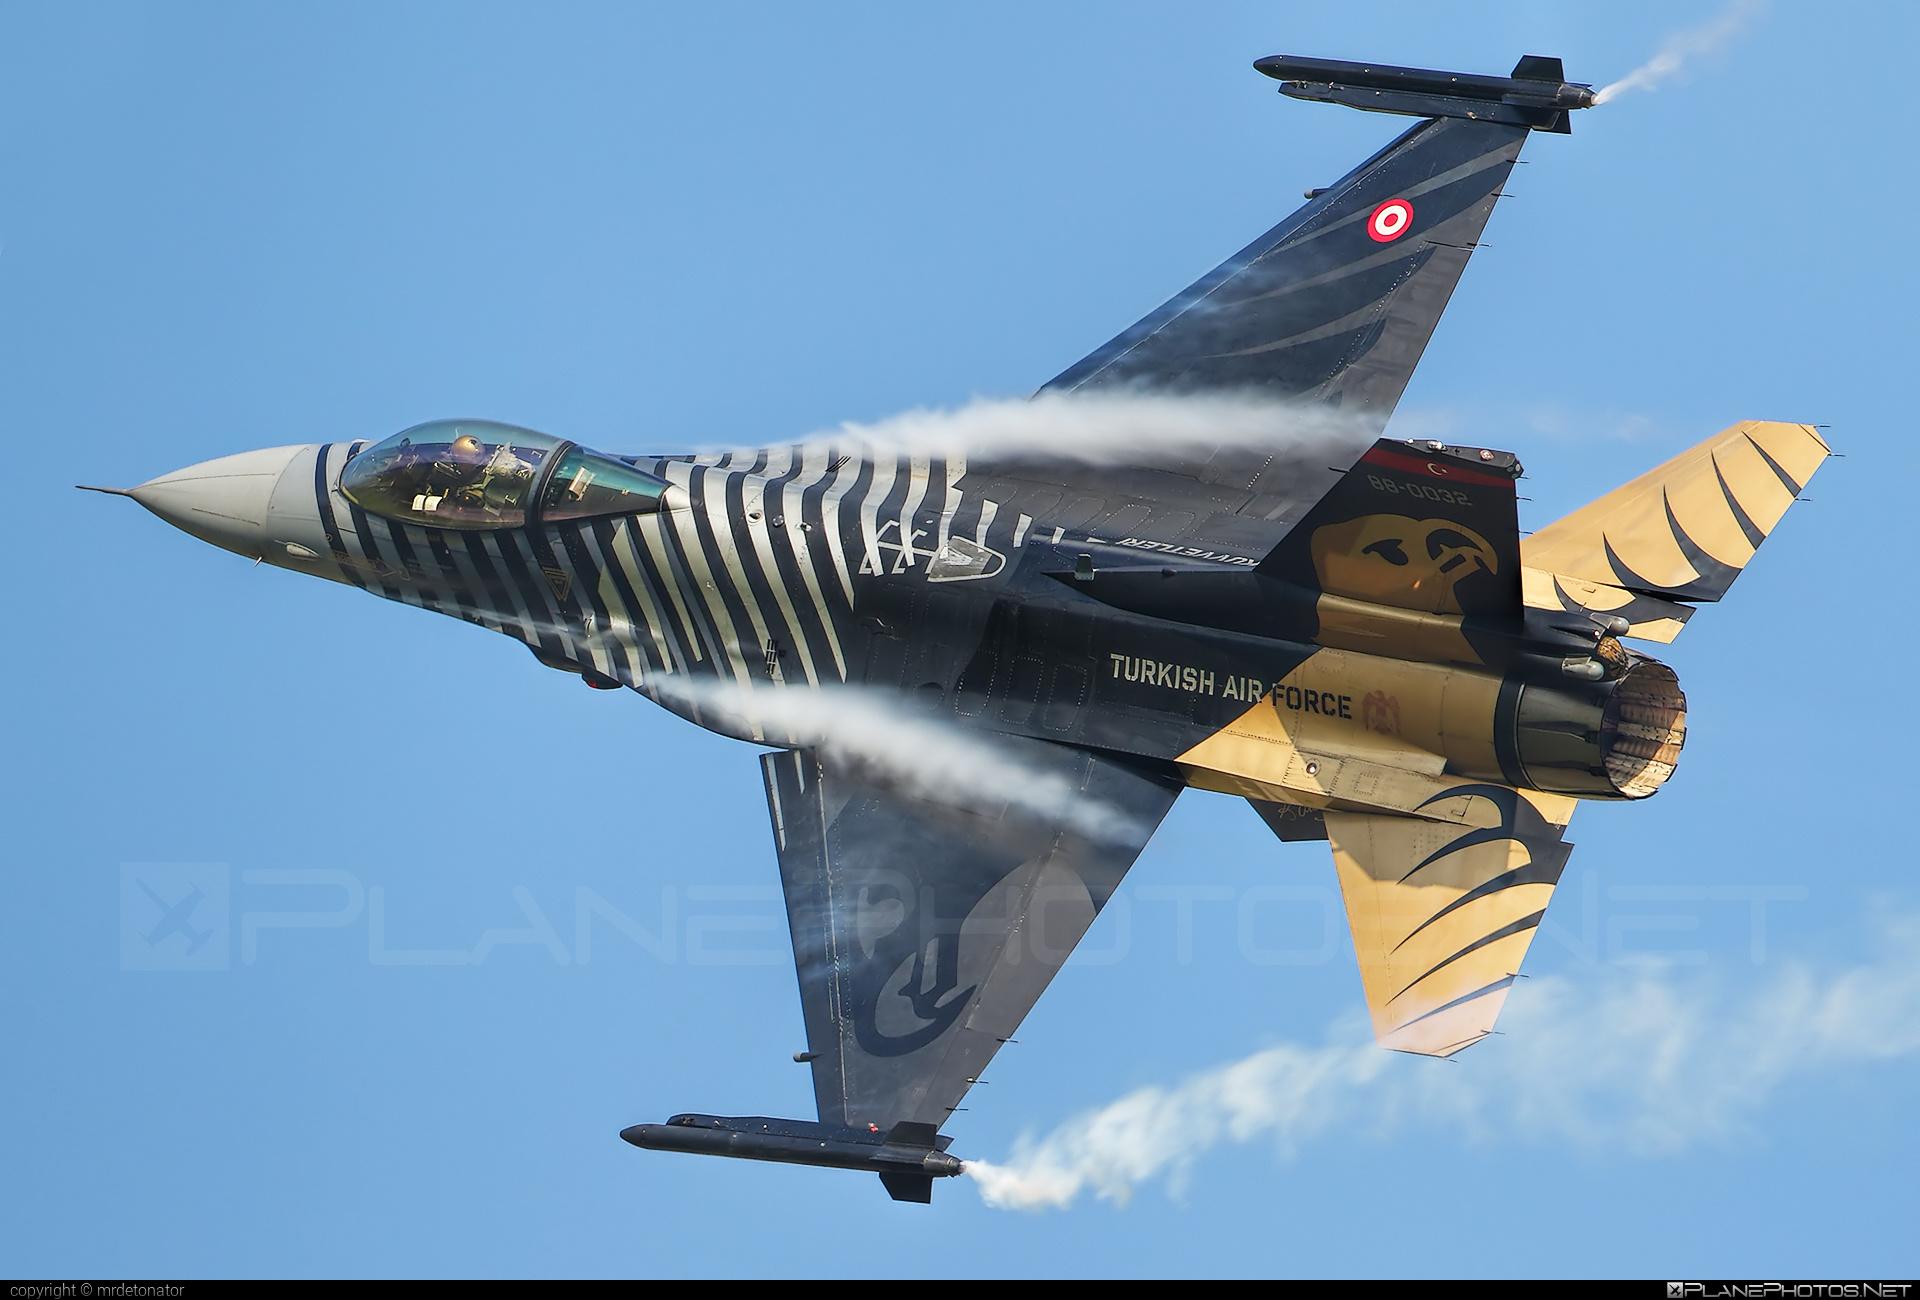 TAI F-16C Fighting Falcon - 88-0032 operated by Türk Hava Kuvvetleri (Turkish Air Force) #f16 #f16c #fightingfalcon #turkishairforce